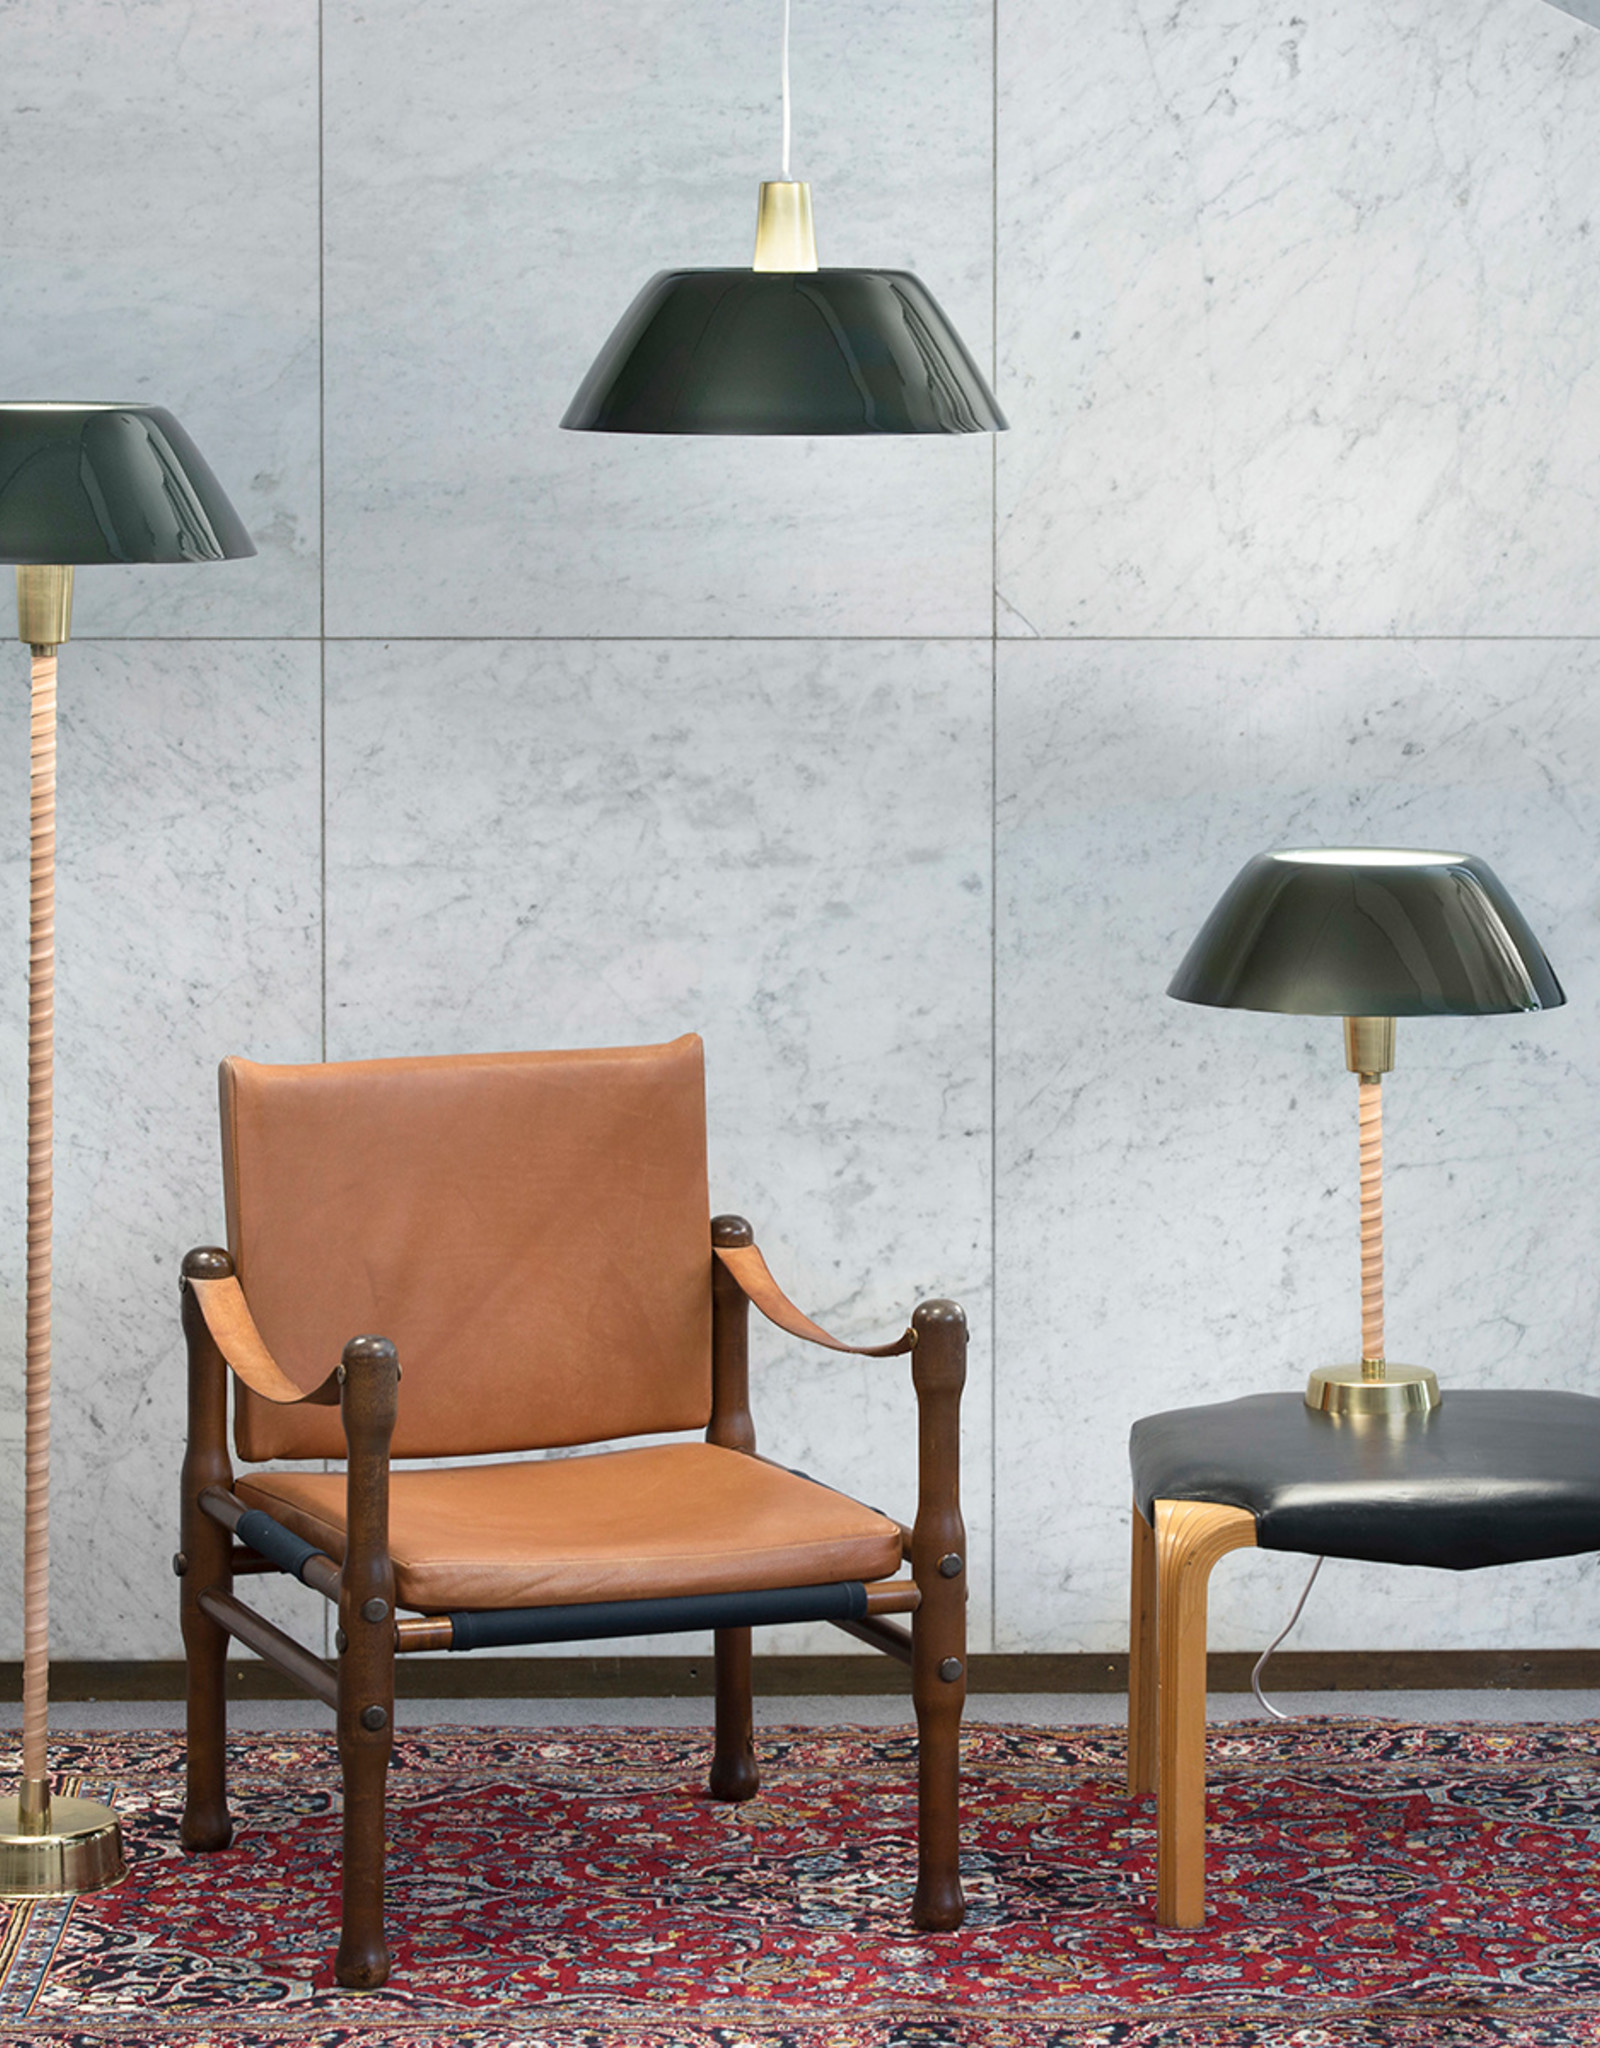 Senator floor lamp by Lisa Johansson-Papeand | Green